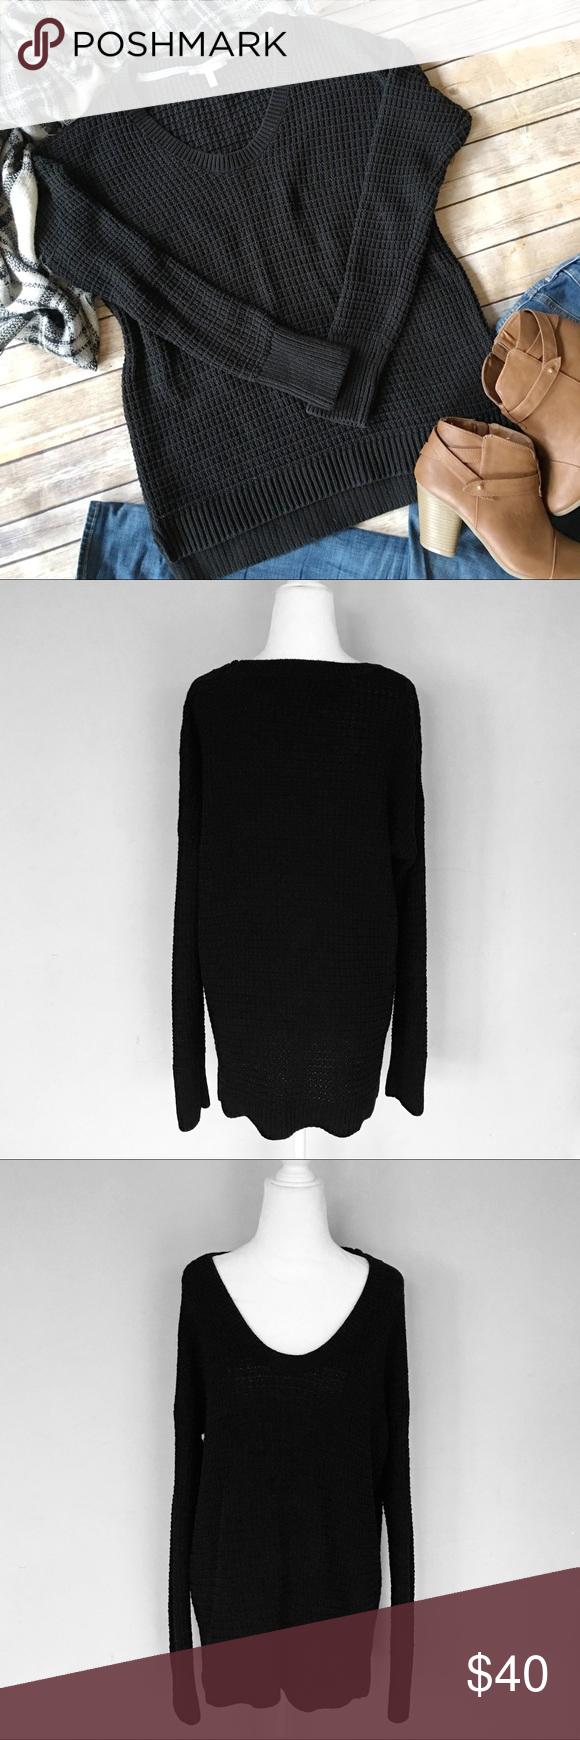 Victoria's Secret Oversized Black Sweater